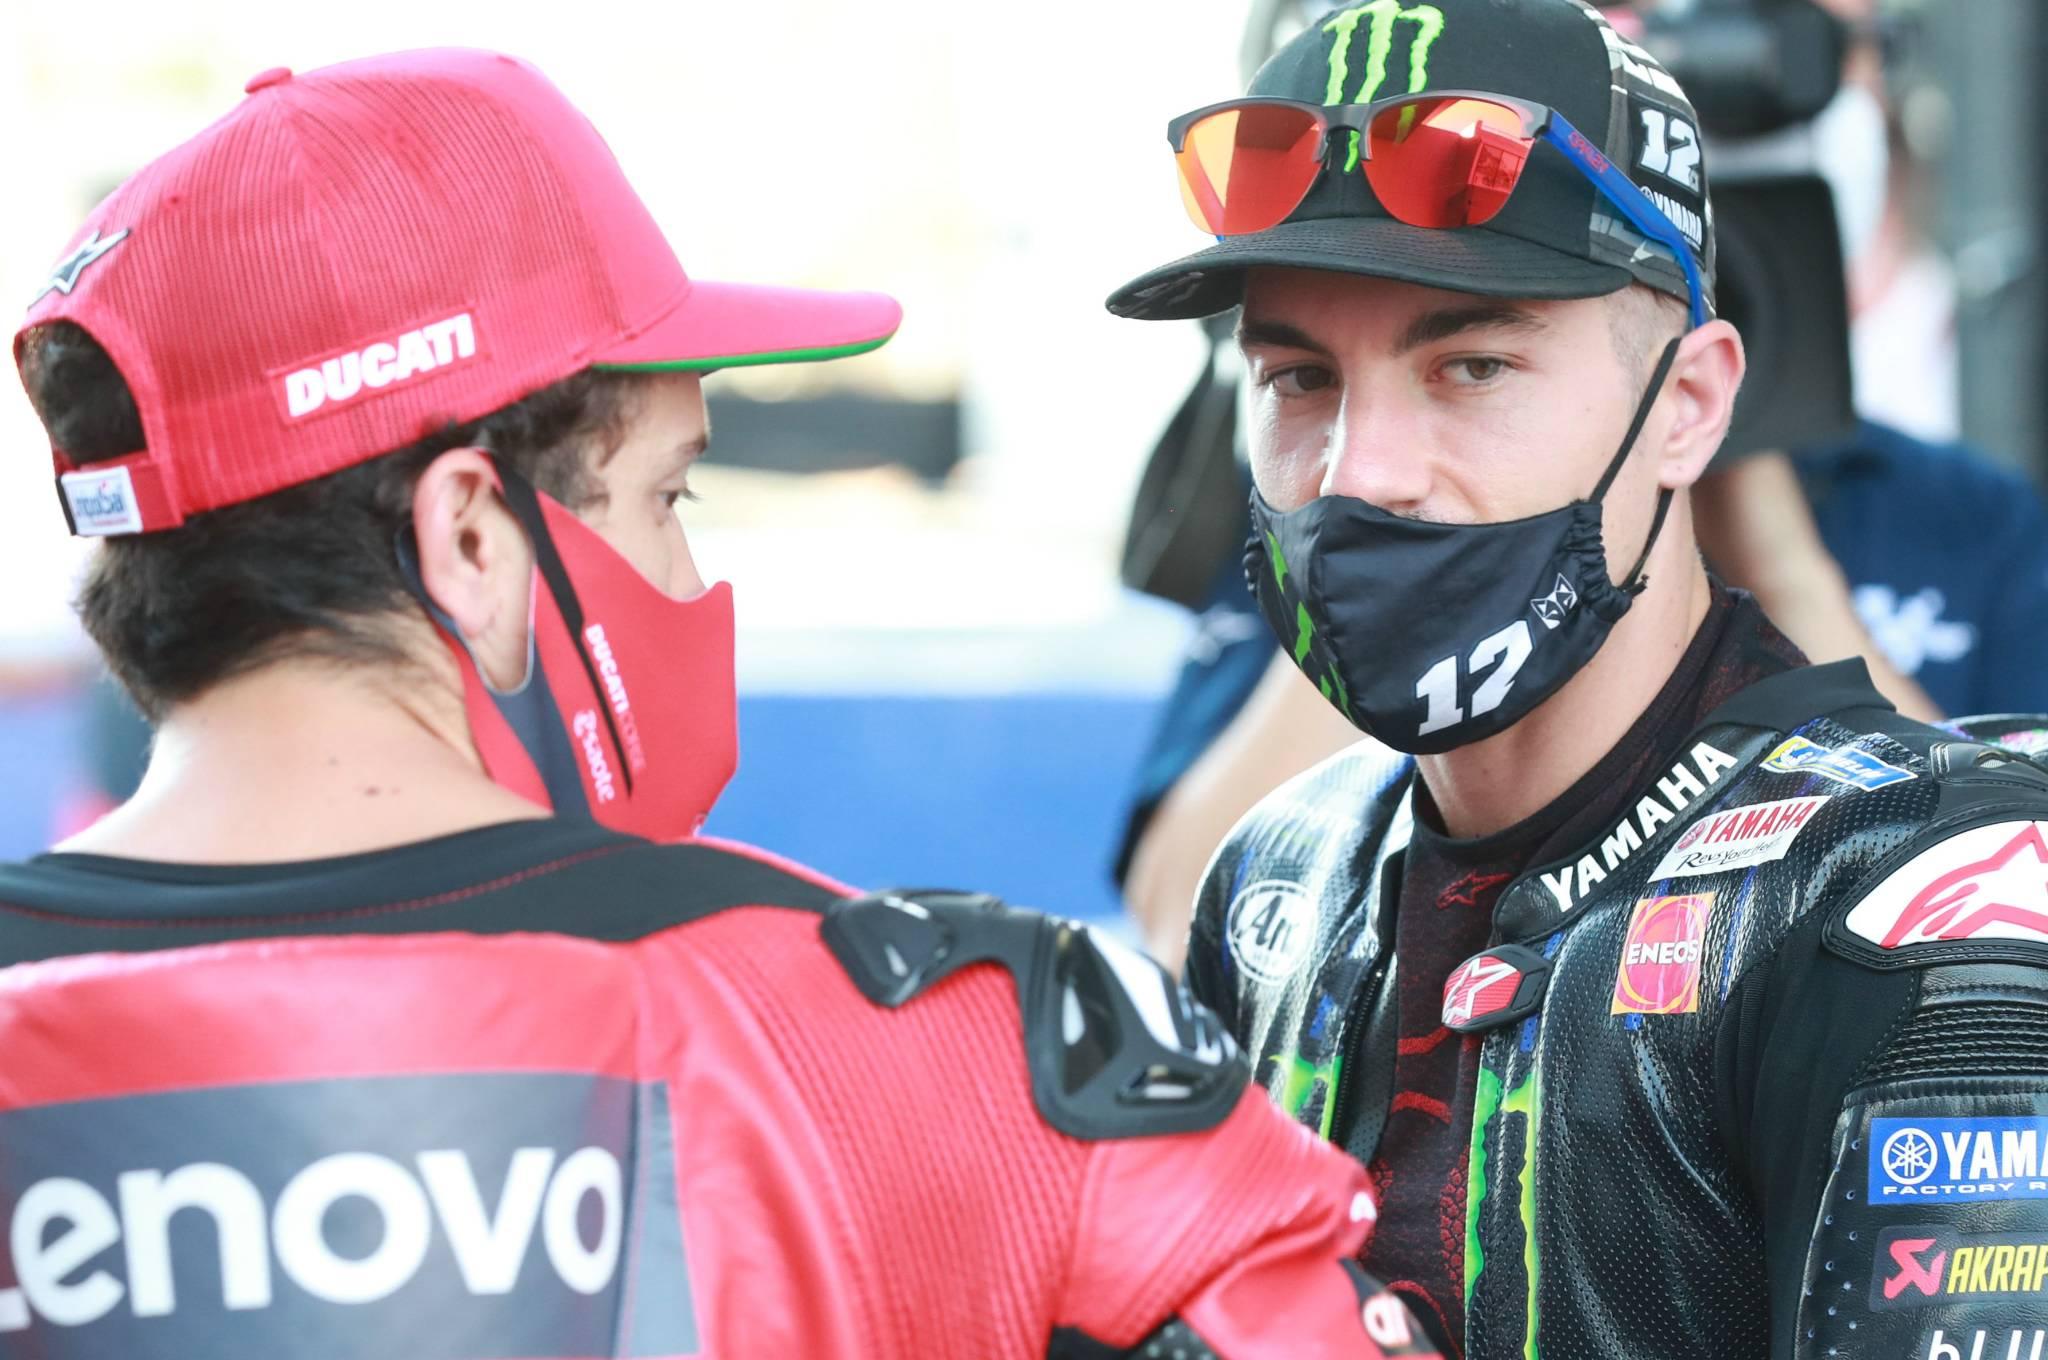 Andrea Dovizioso, Maverick Vinales, Spanish MotoGP, 16 July 2020